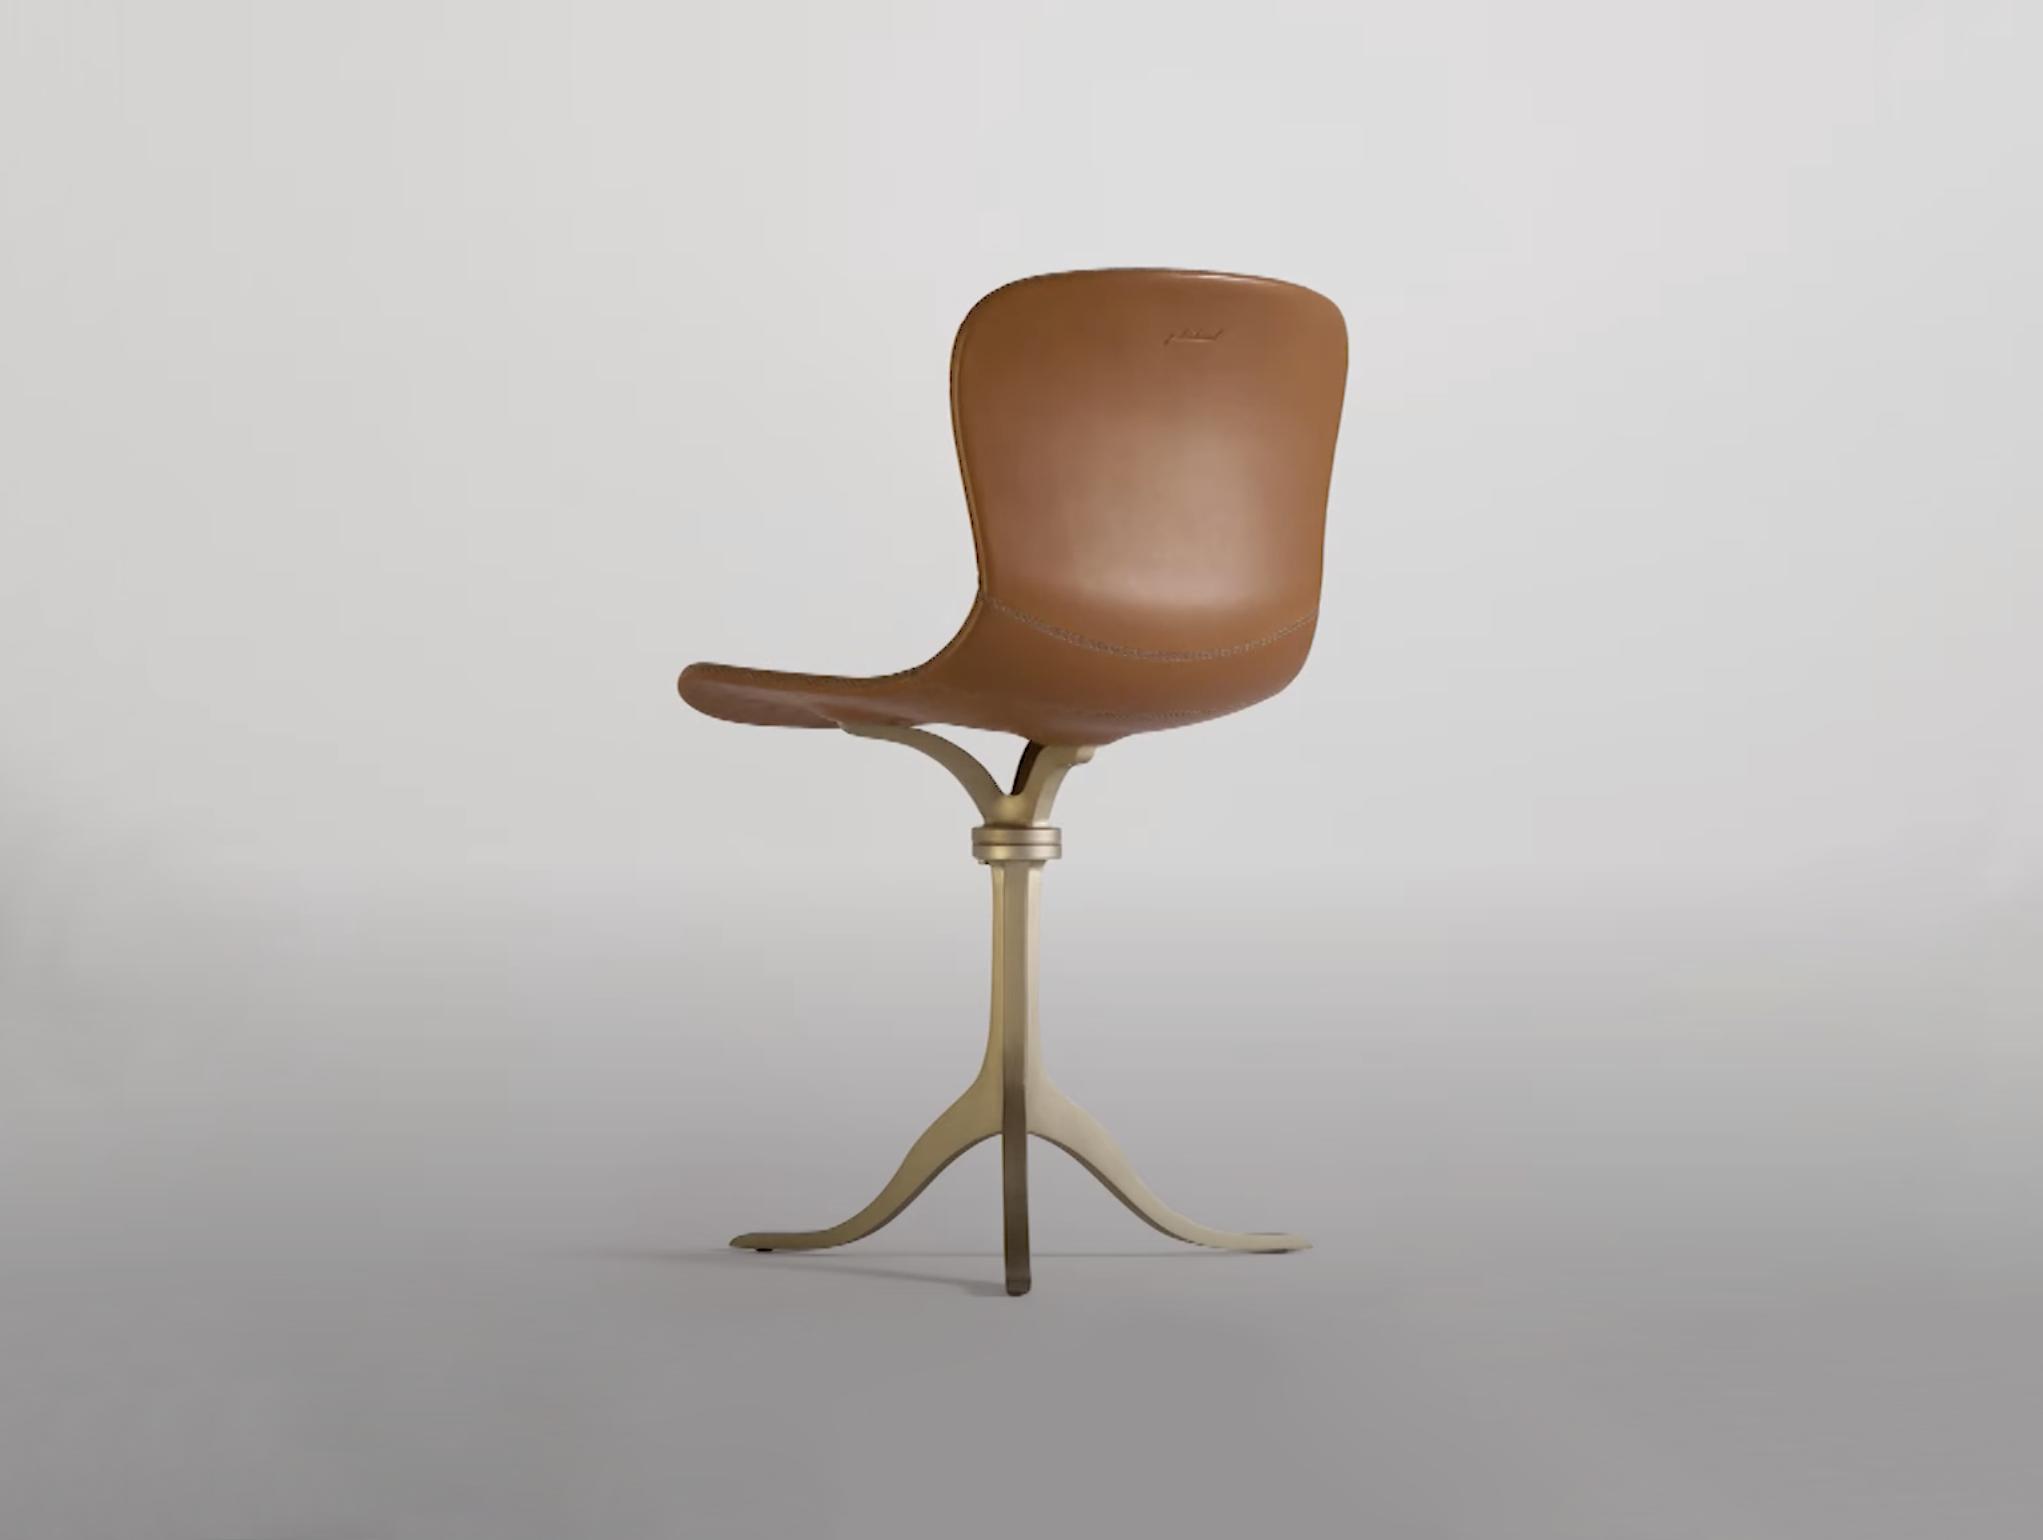 P. Tendercool - PT43 Chair + Swivel